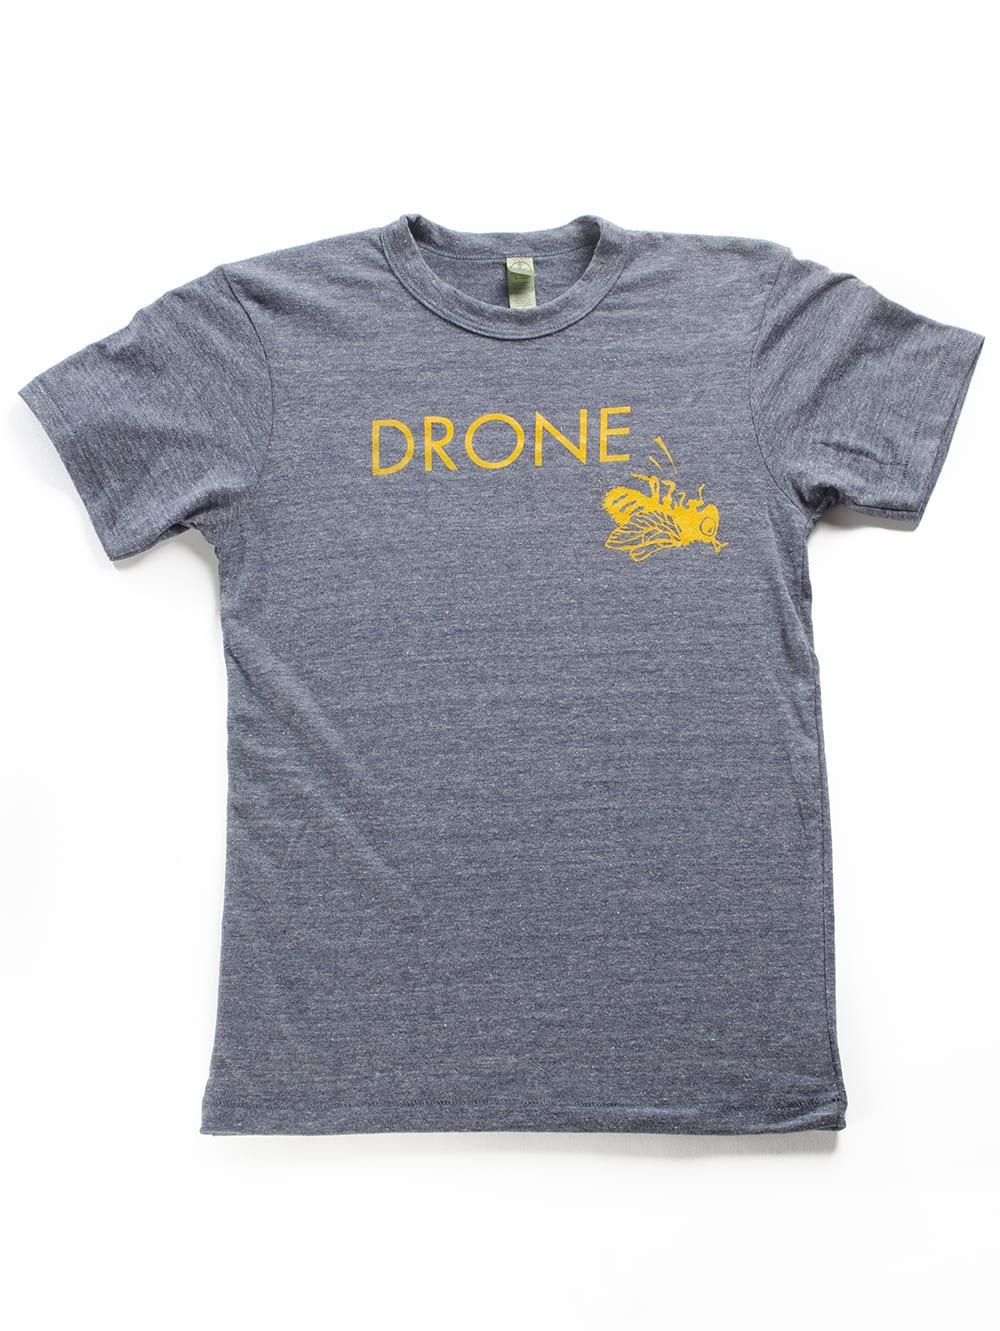 Drone Bee T-Shirt - Worker B - Worker B on